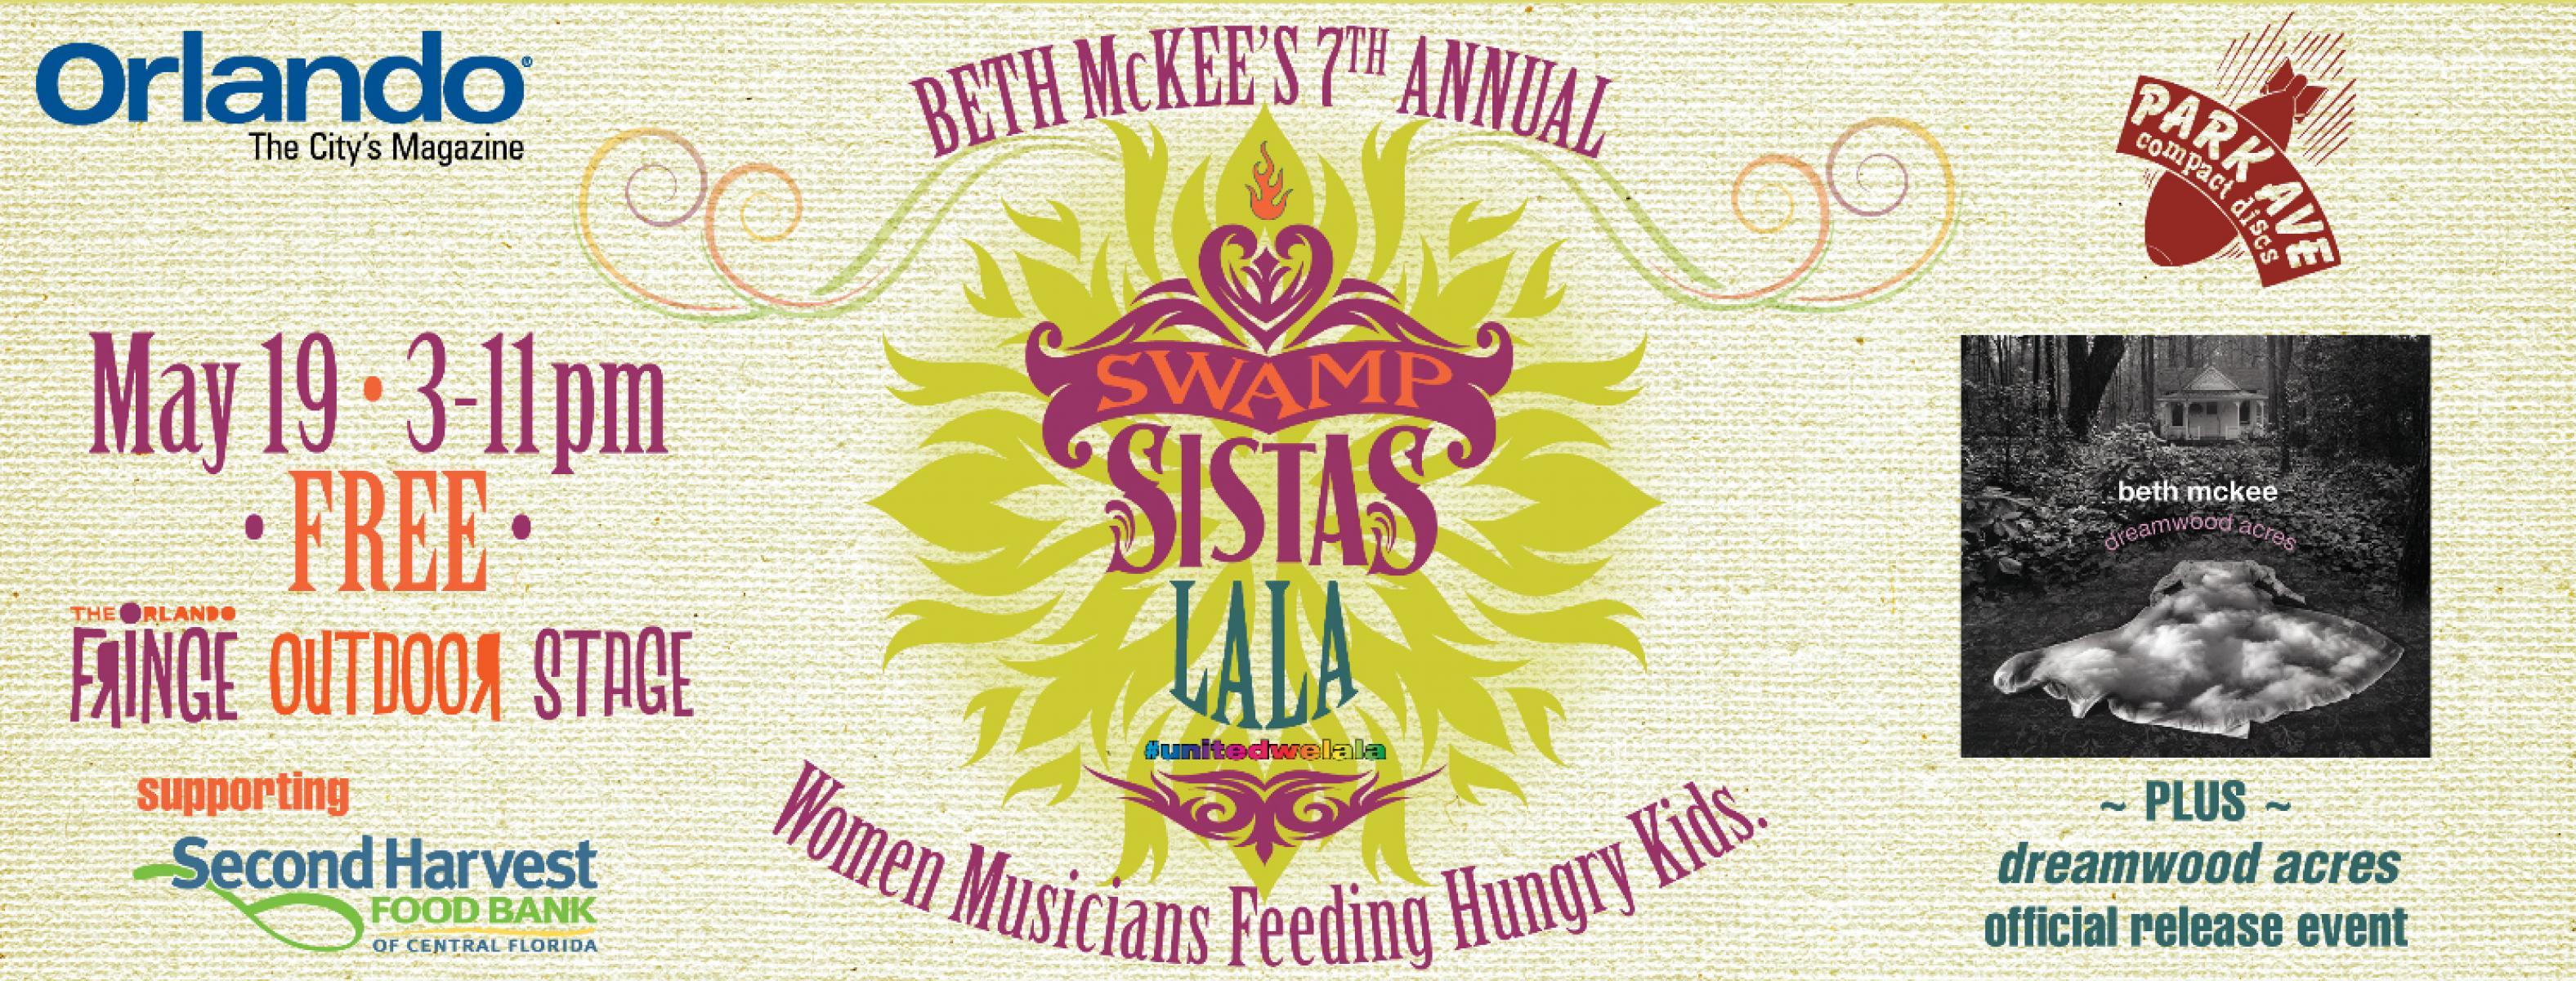 7th Annual Swamp Sistas La La at Orlando Fringe